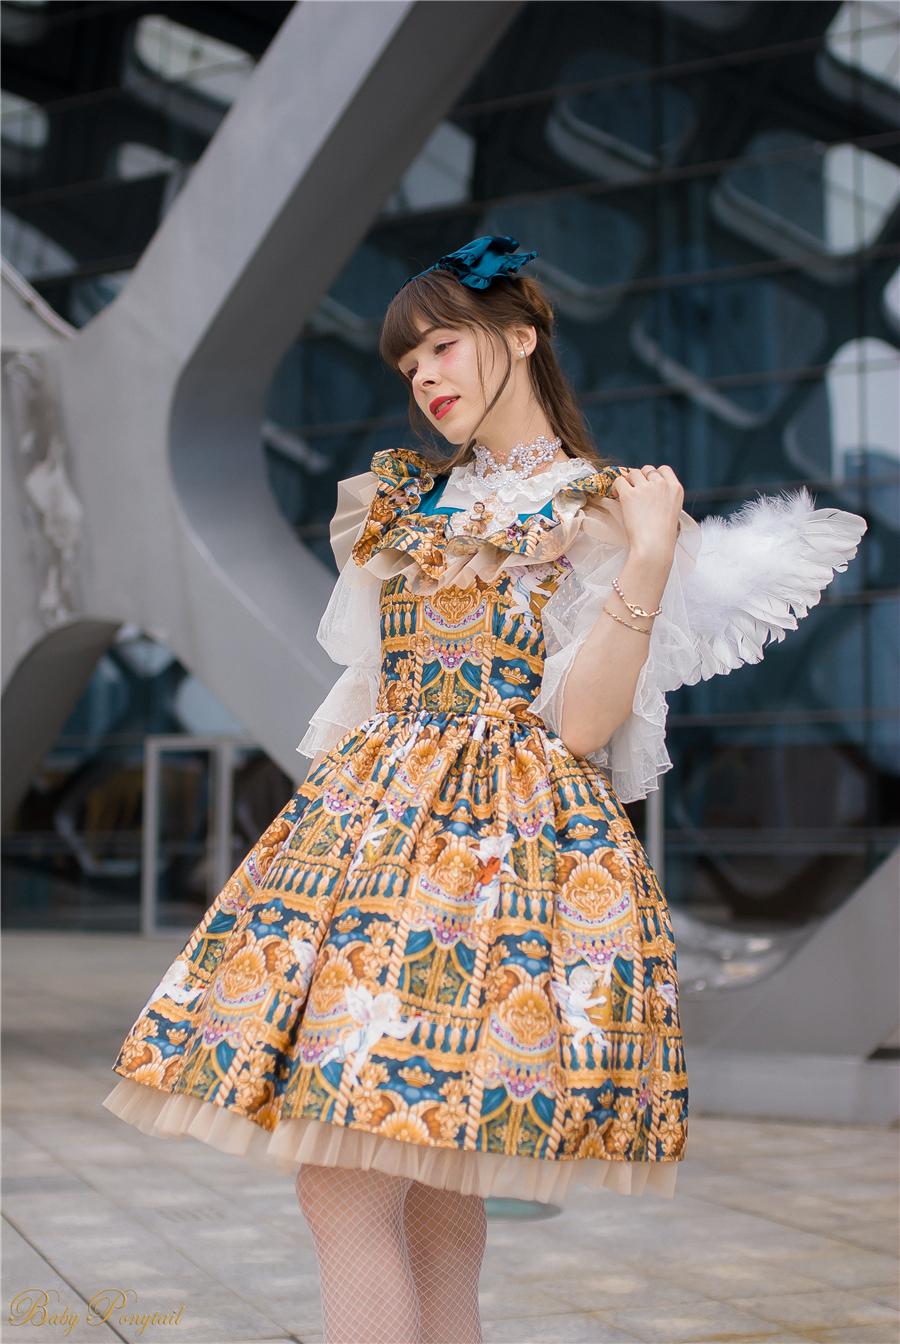 Babyponytail_Model_Ruffle Collar JSK_Tiel Angel_2_Claudia_3.jpg